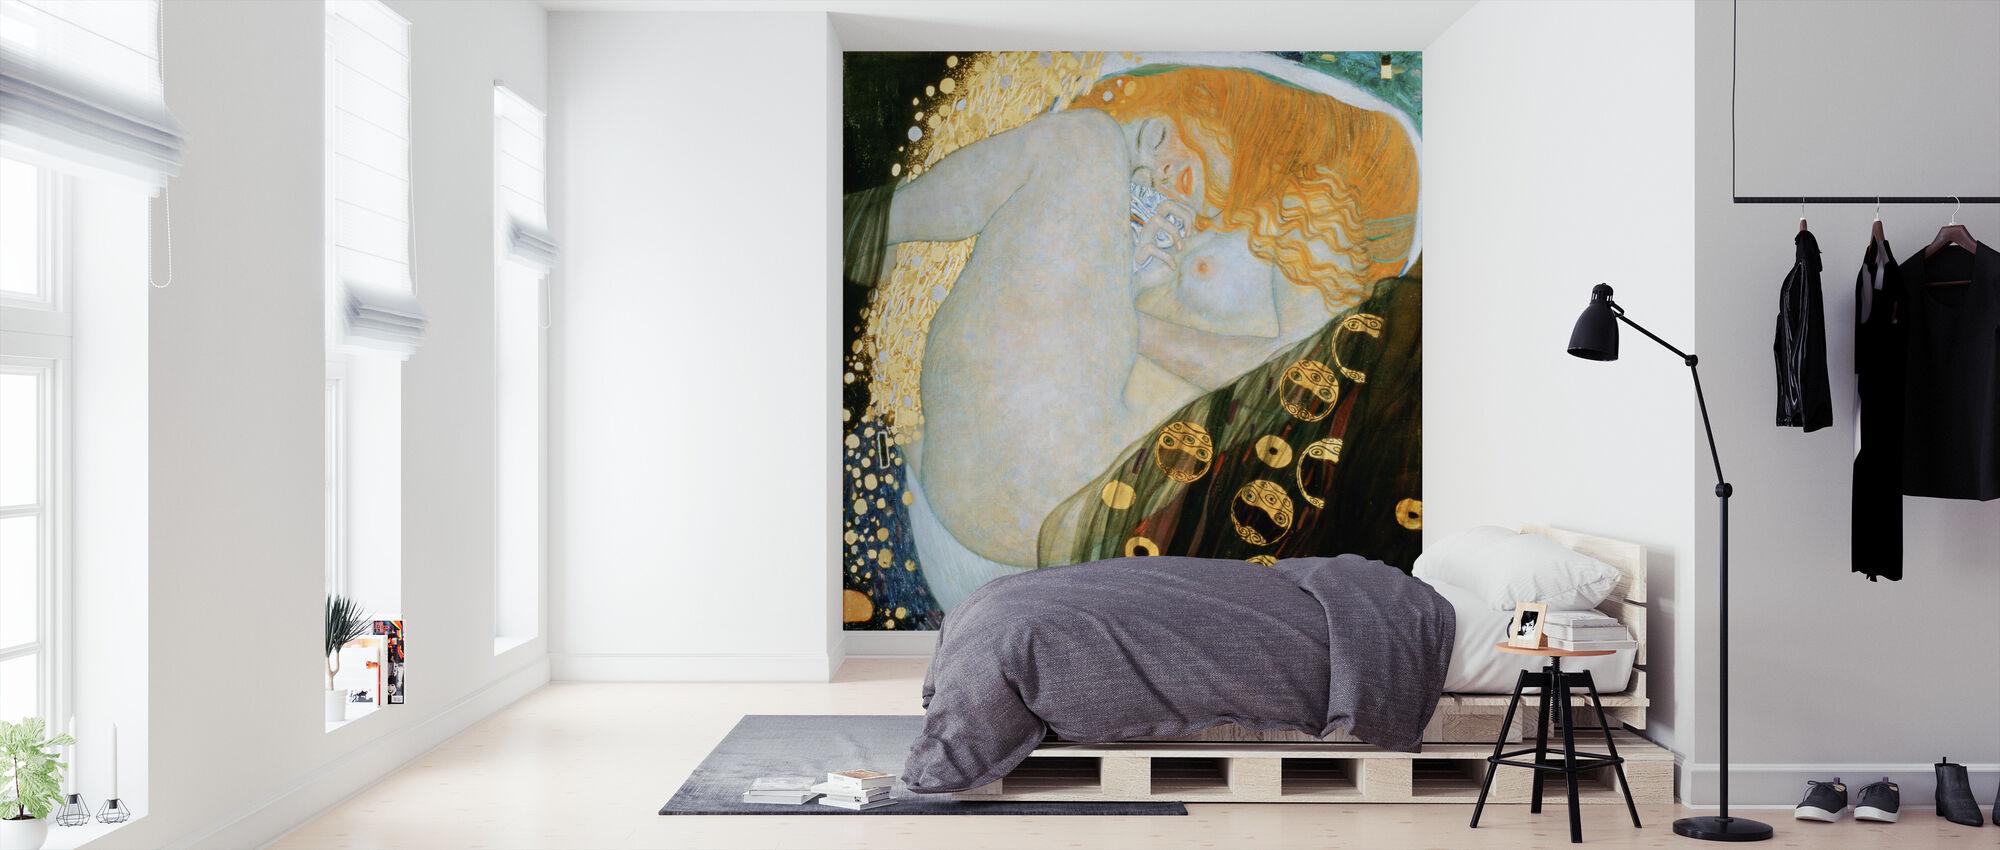 Danae, Gustav Klimt - Wallpaper - Bedroom